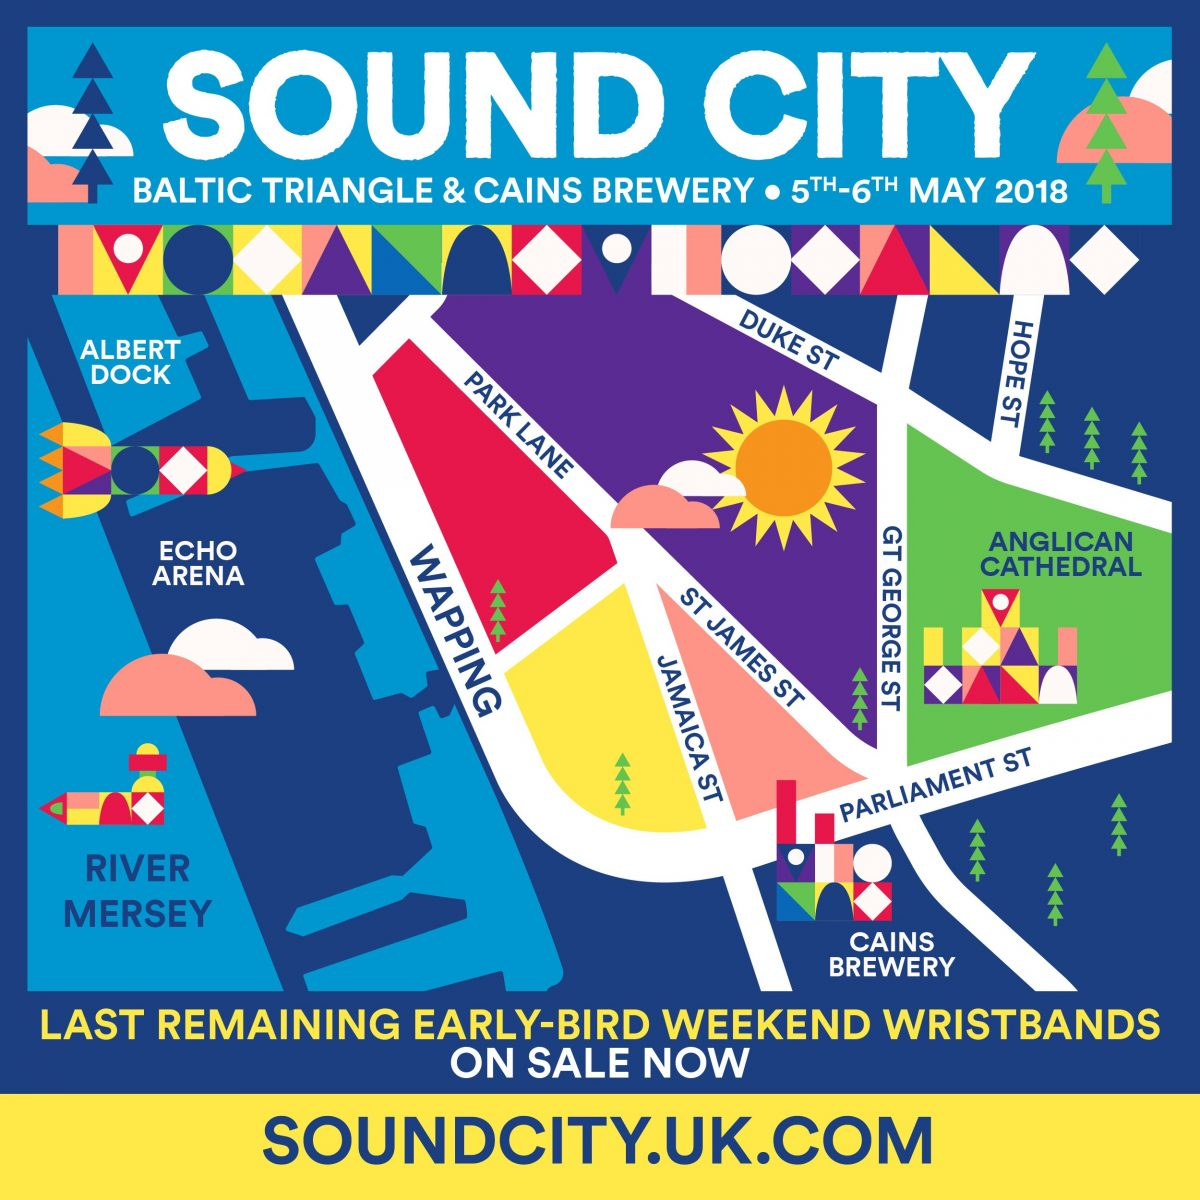 Sound City 2018 map